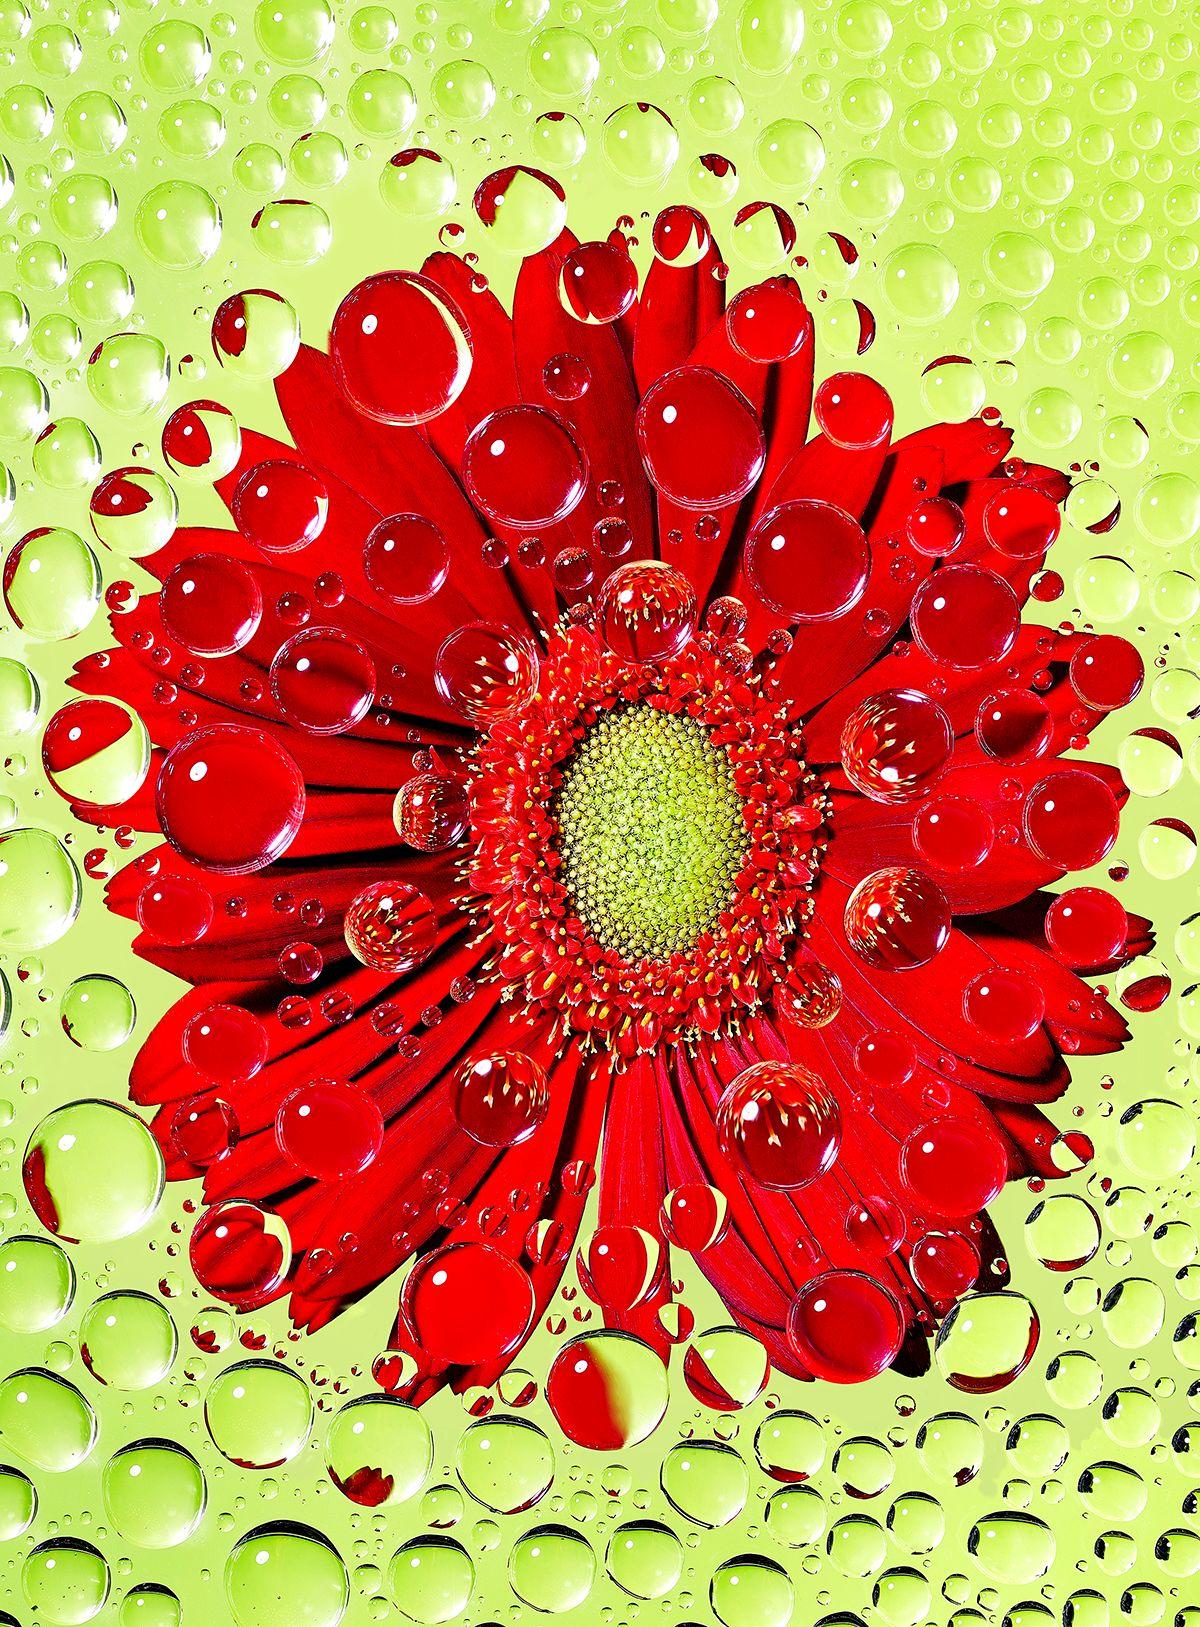 flower_droplets4x6.jpg